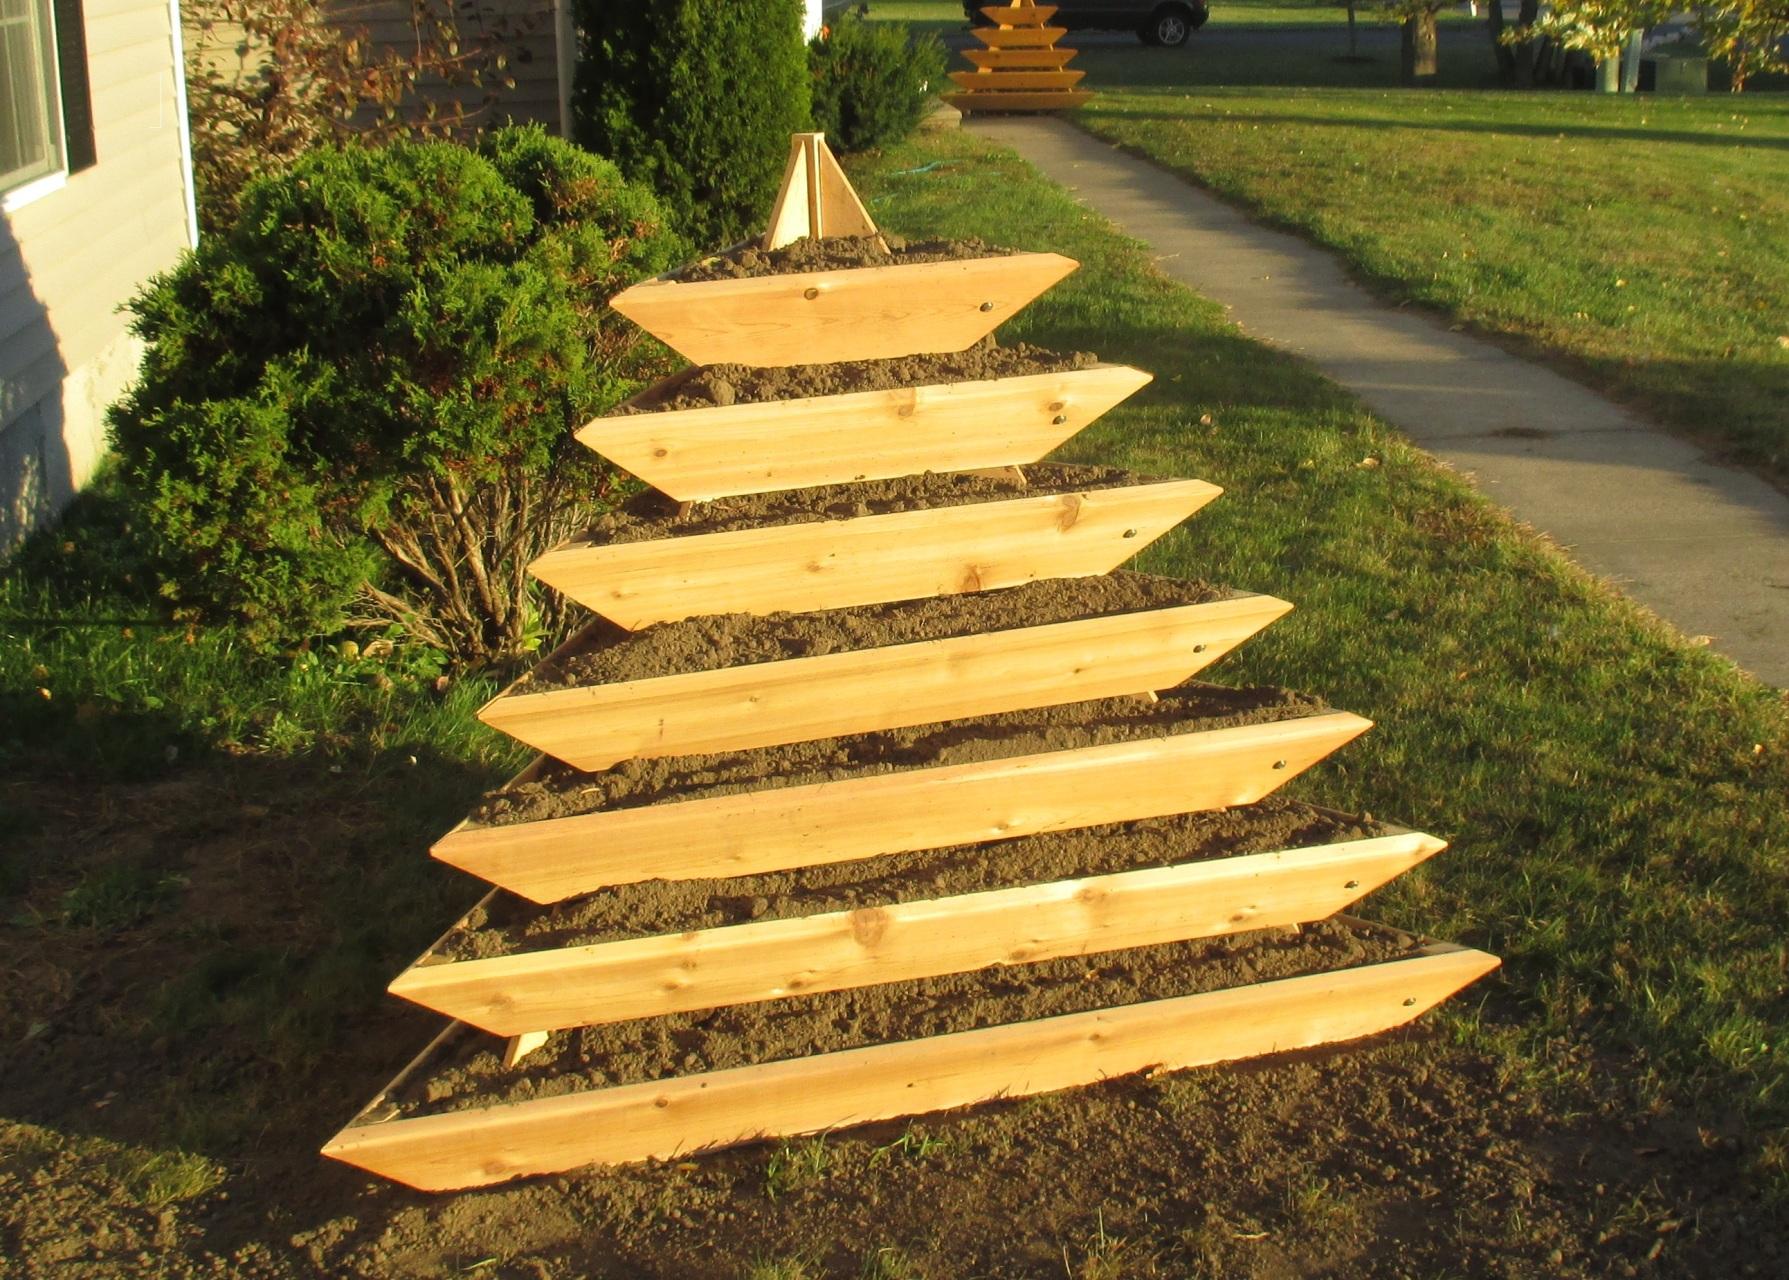 Grande Plant Pyramid Levels Our Products Infinite Cedar Herb Garden Pyramid Diy Layout Herb Garden Vertical Pyramid garden Pyramid Herb Garden